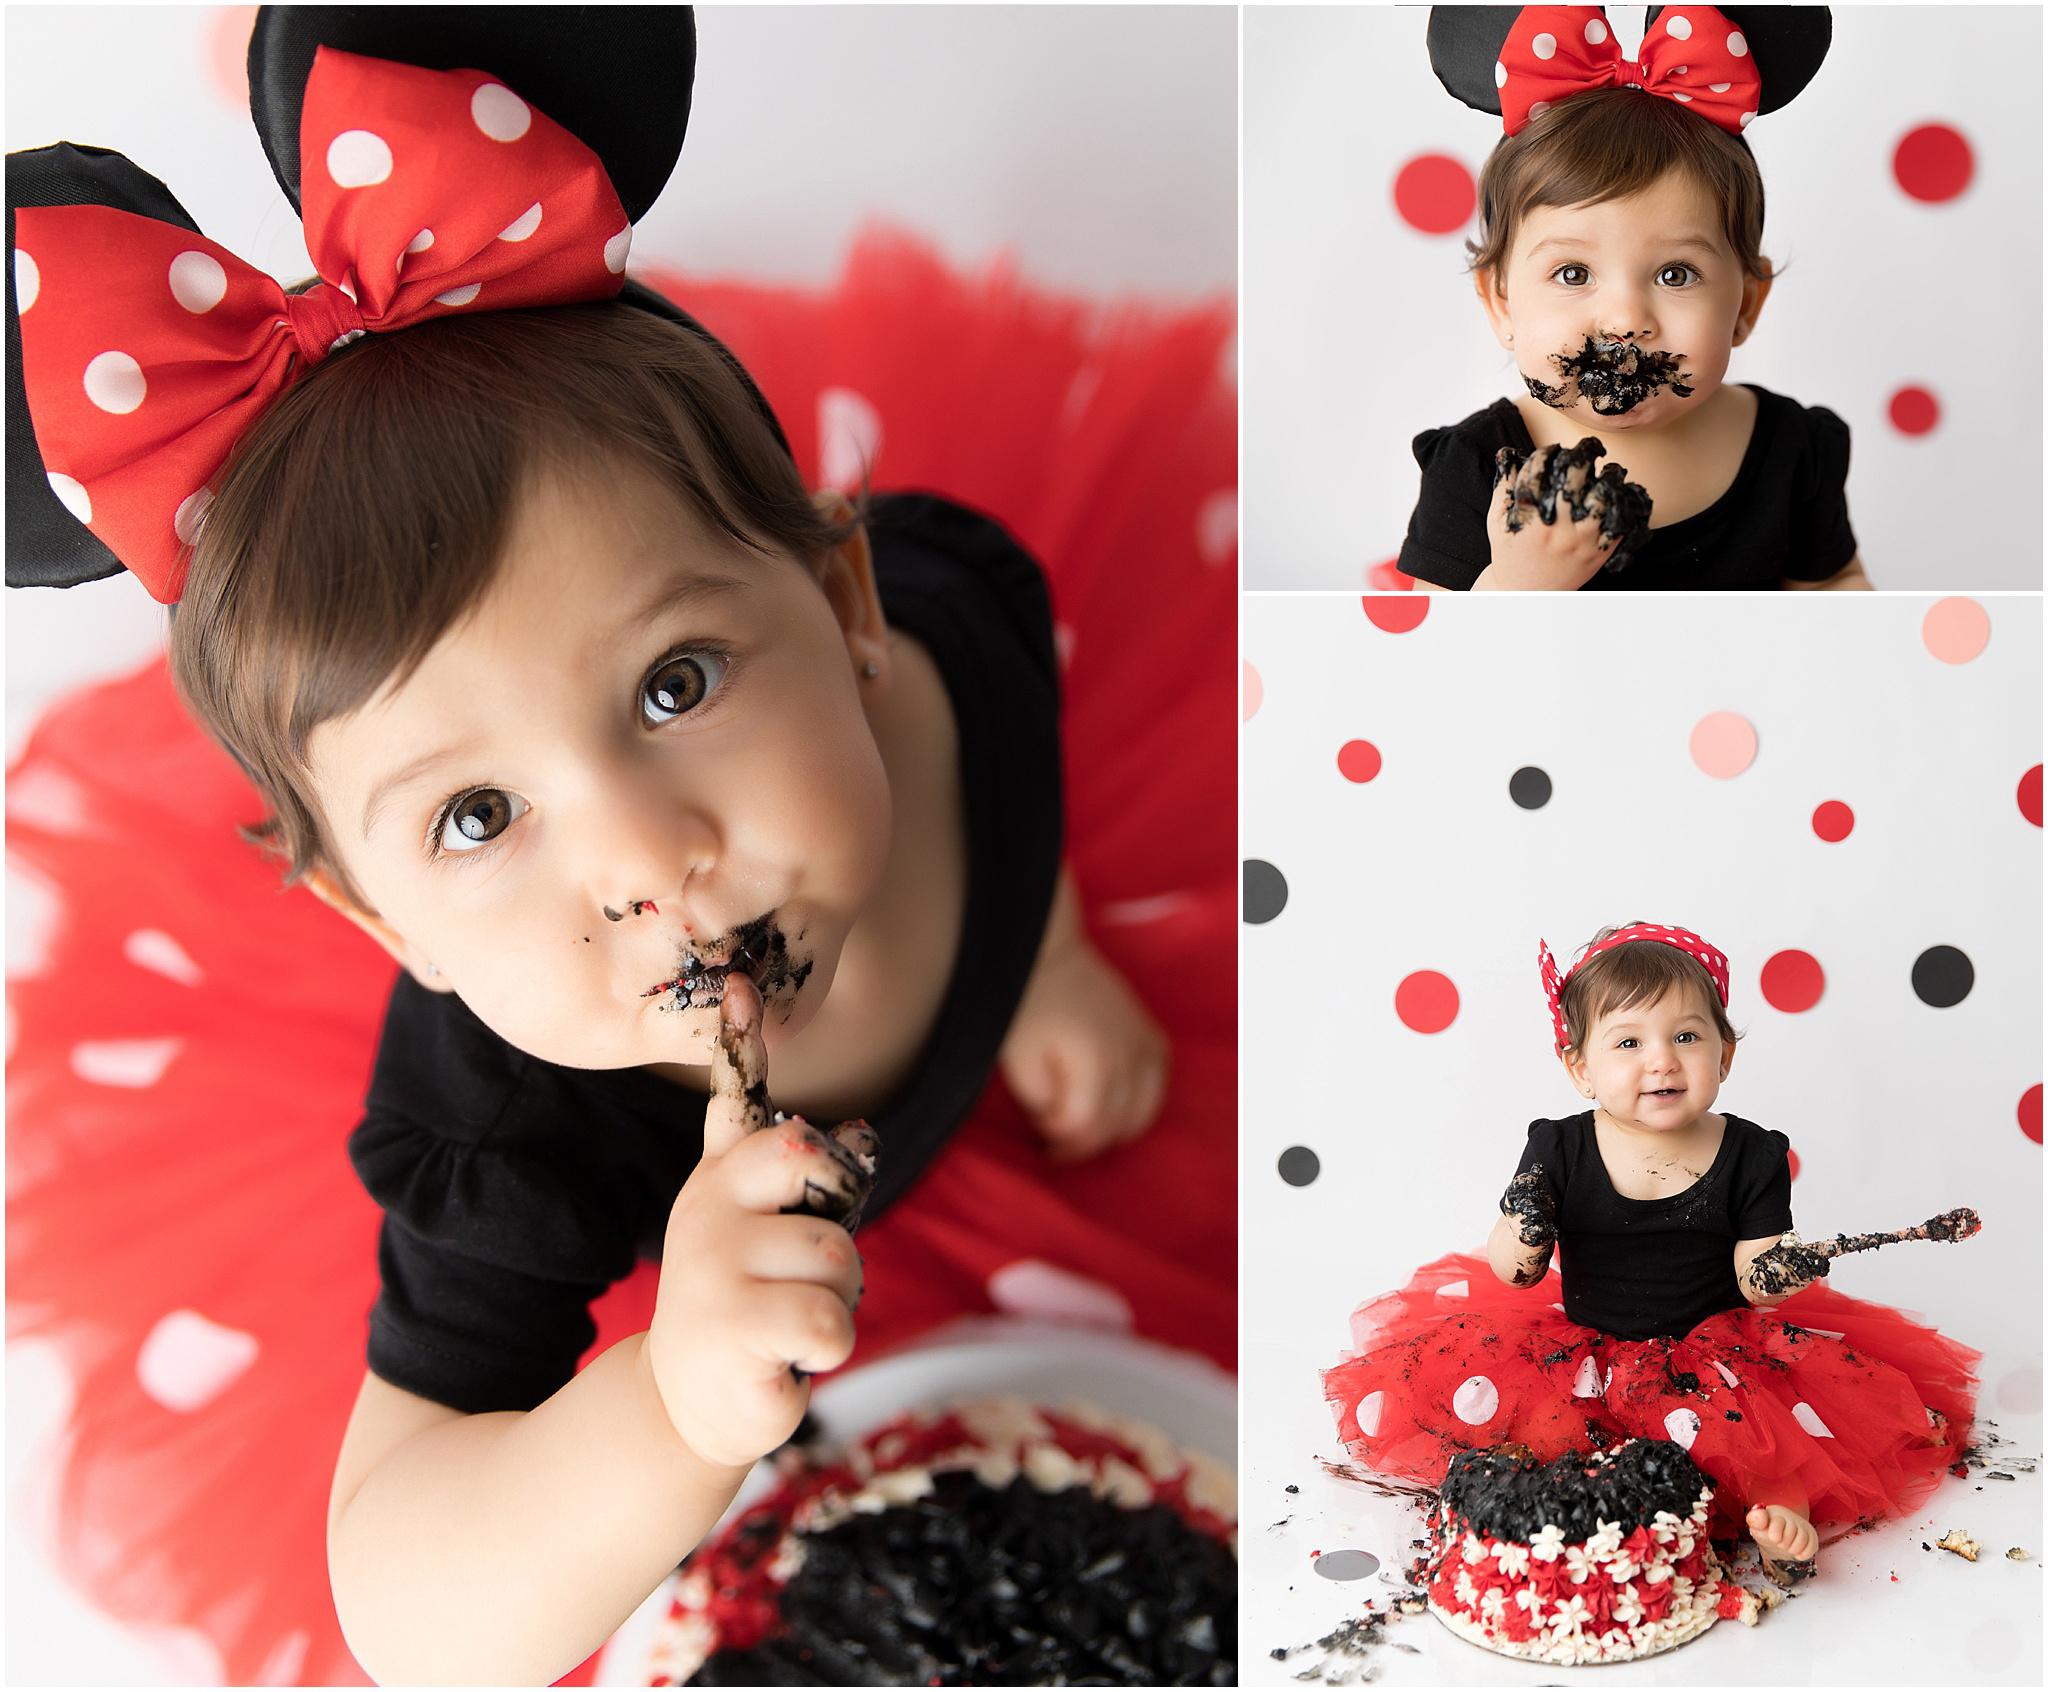 cakesmash+photography+Luciana+Golcman+NYC+26.jpg